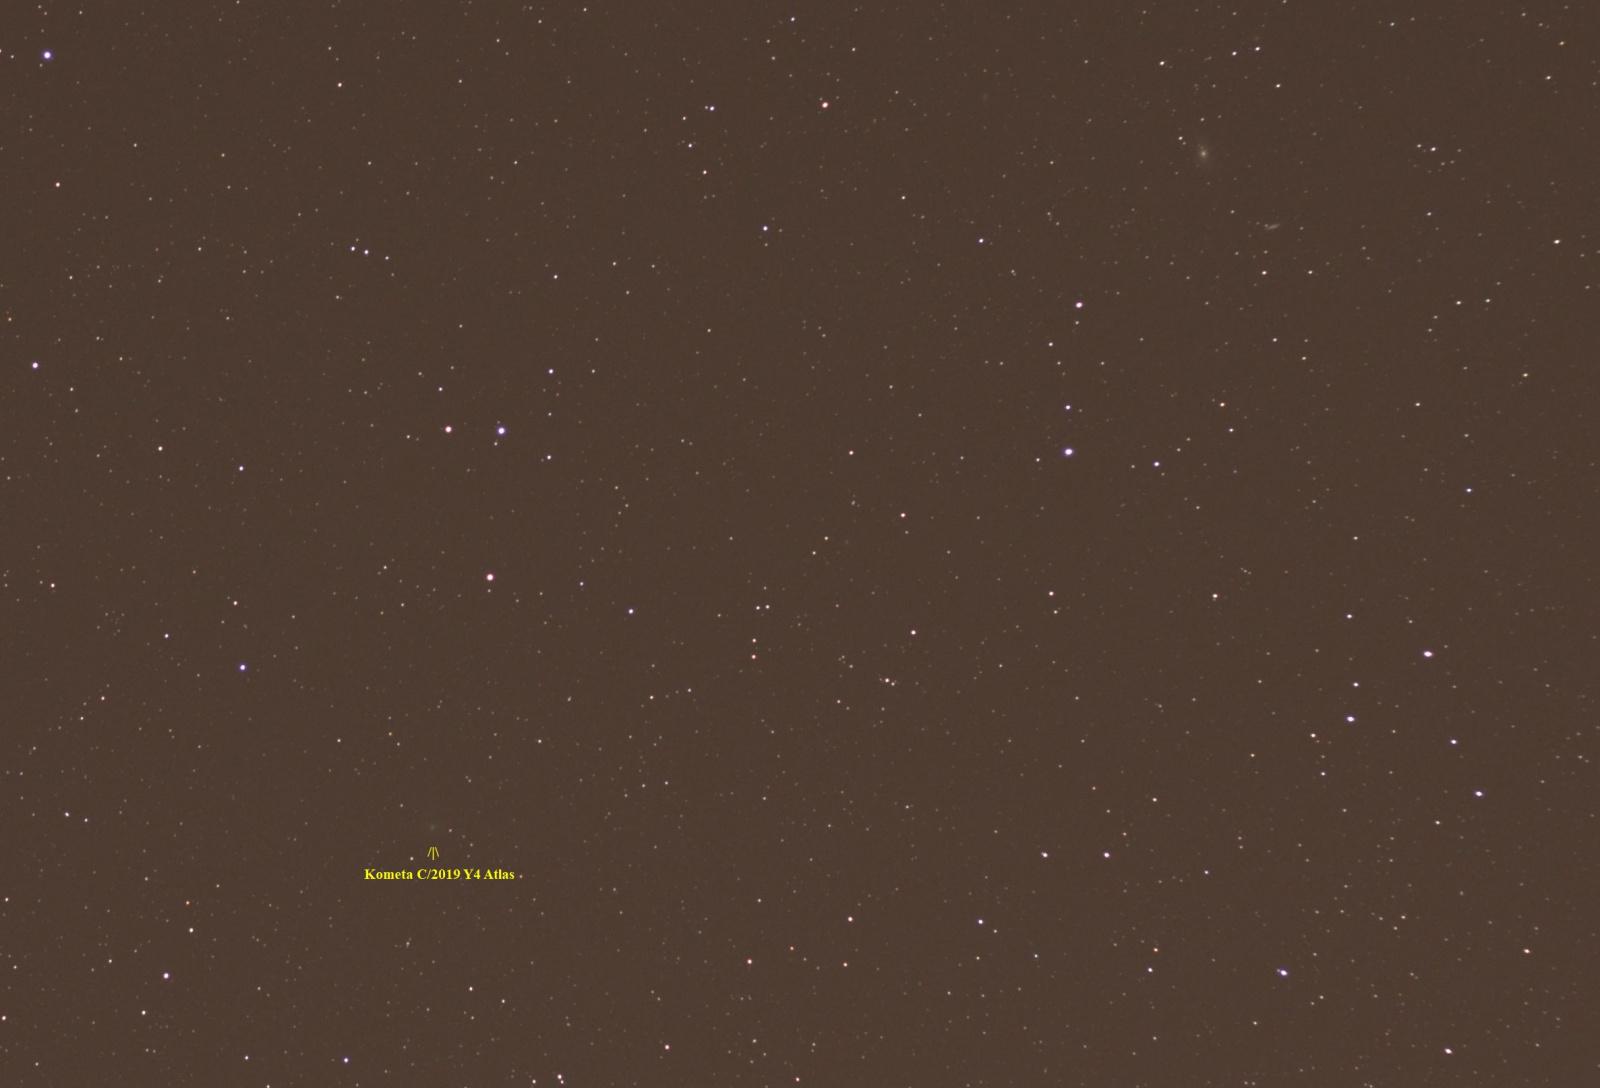 460968040_Kometa_-2-opis1.thumb.jpg.c0b7c4d5dafc6542d0f2b4621b6078a4.jpg